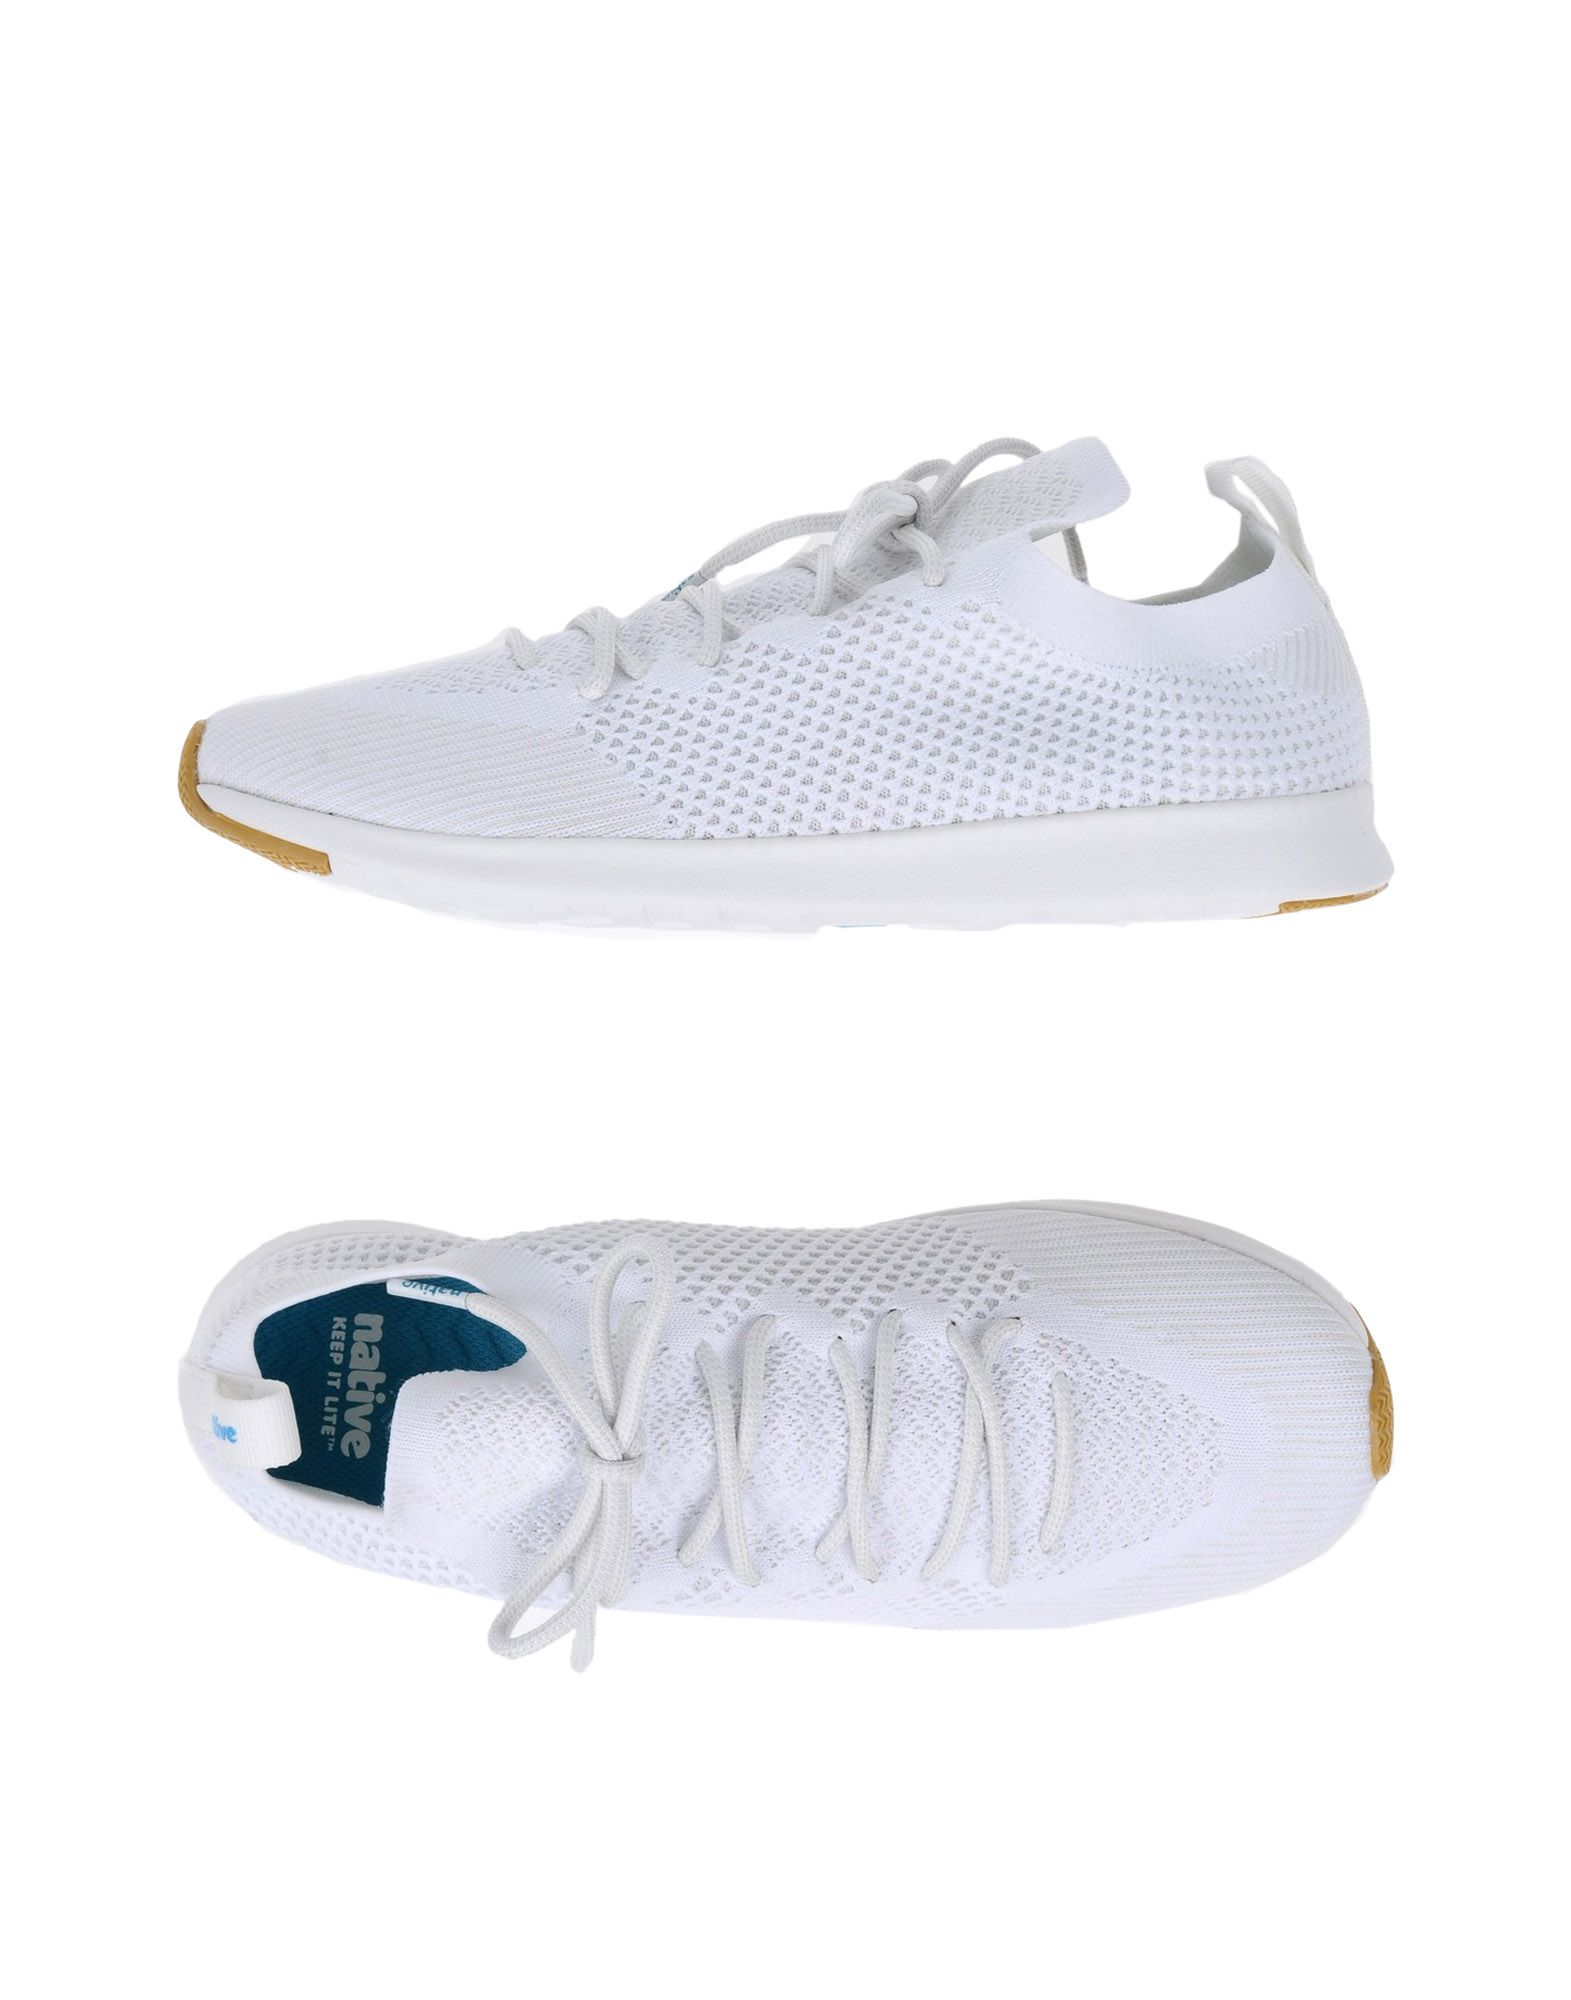 Heiße Native Sneakers Herren  11338422ER Heiße  Schuhe bfab33